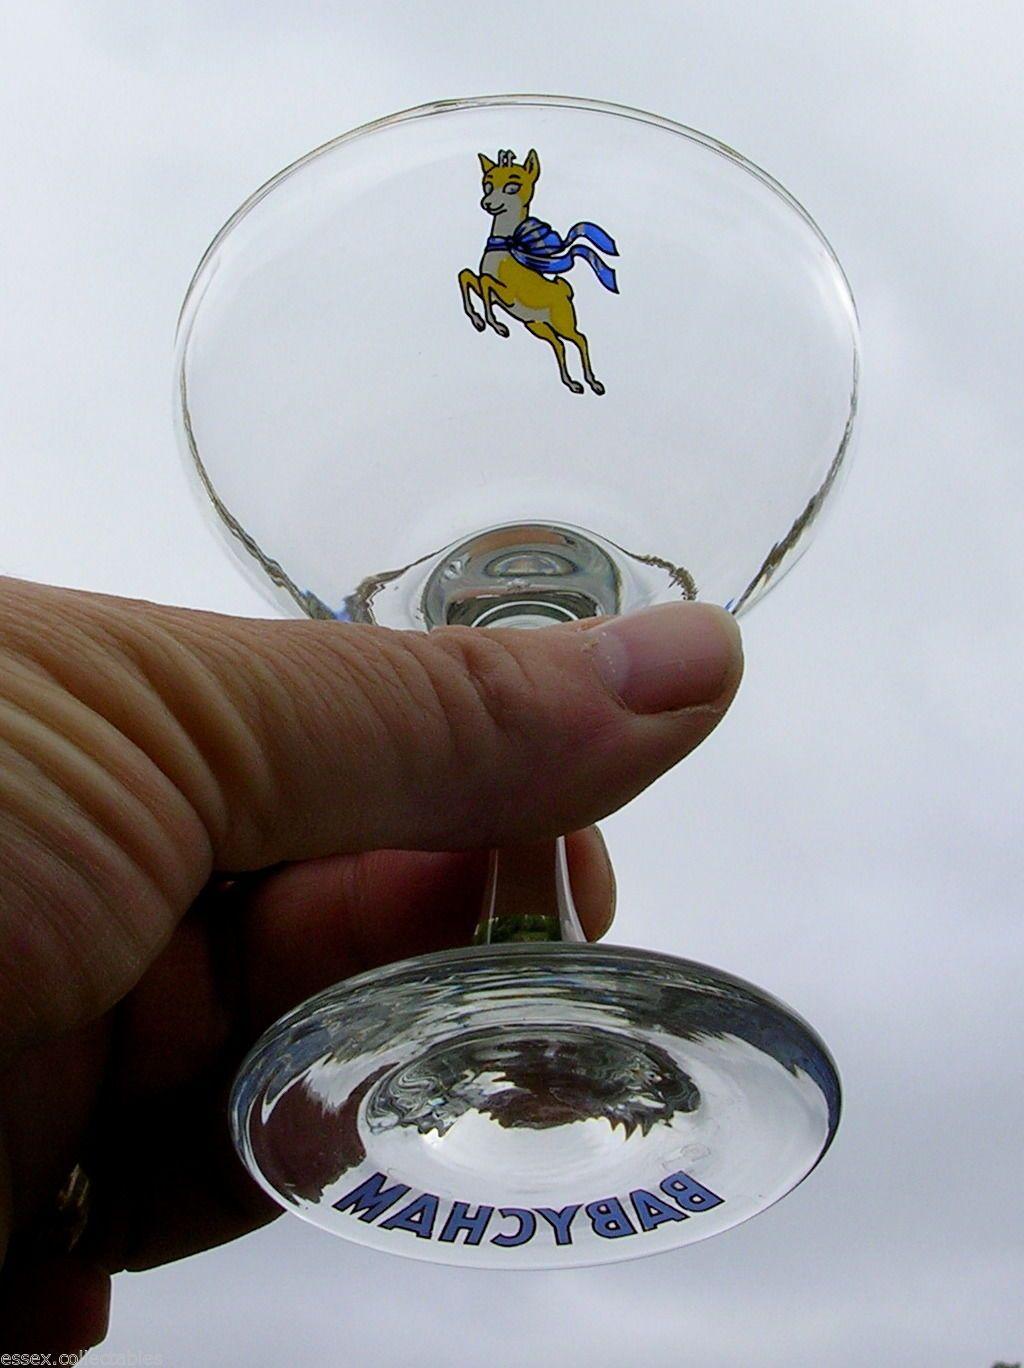 SET 4 Vintage BABYCHAM Glasses - Yellow Prancing Fawn | eBay